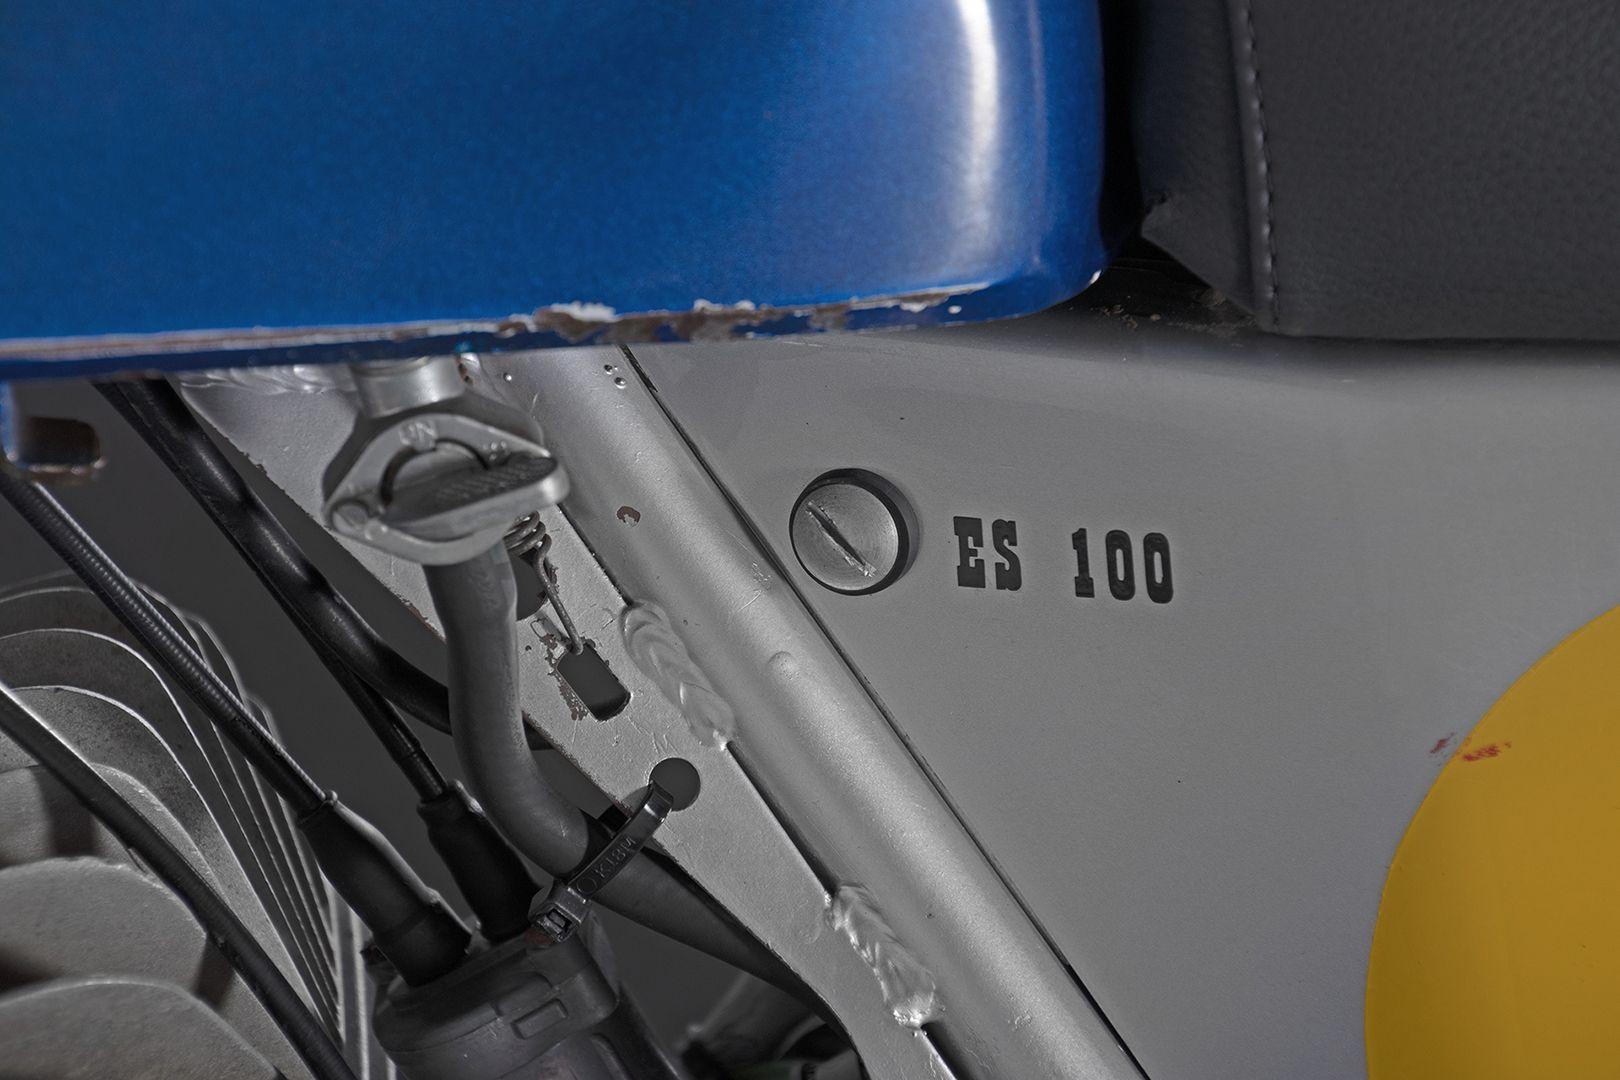 1974 SWM 125 53201